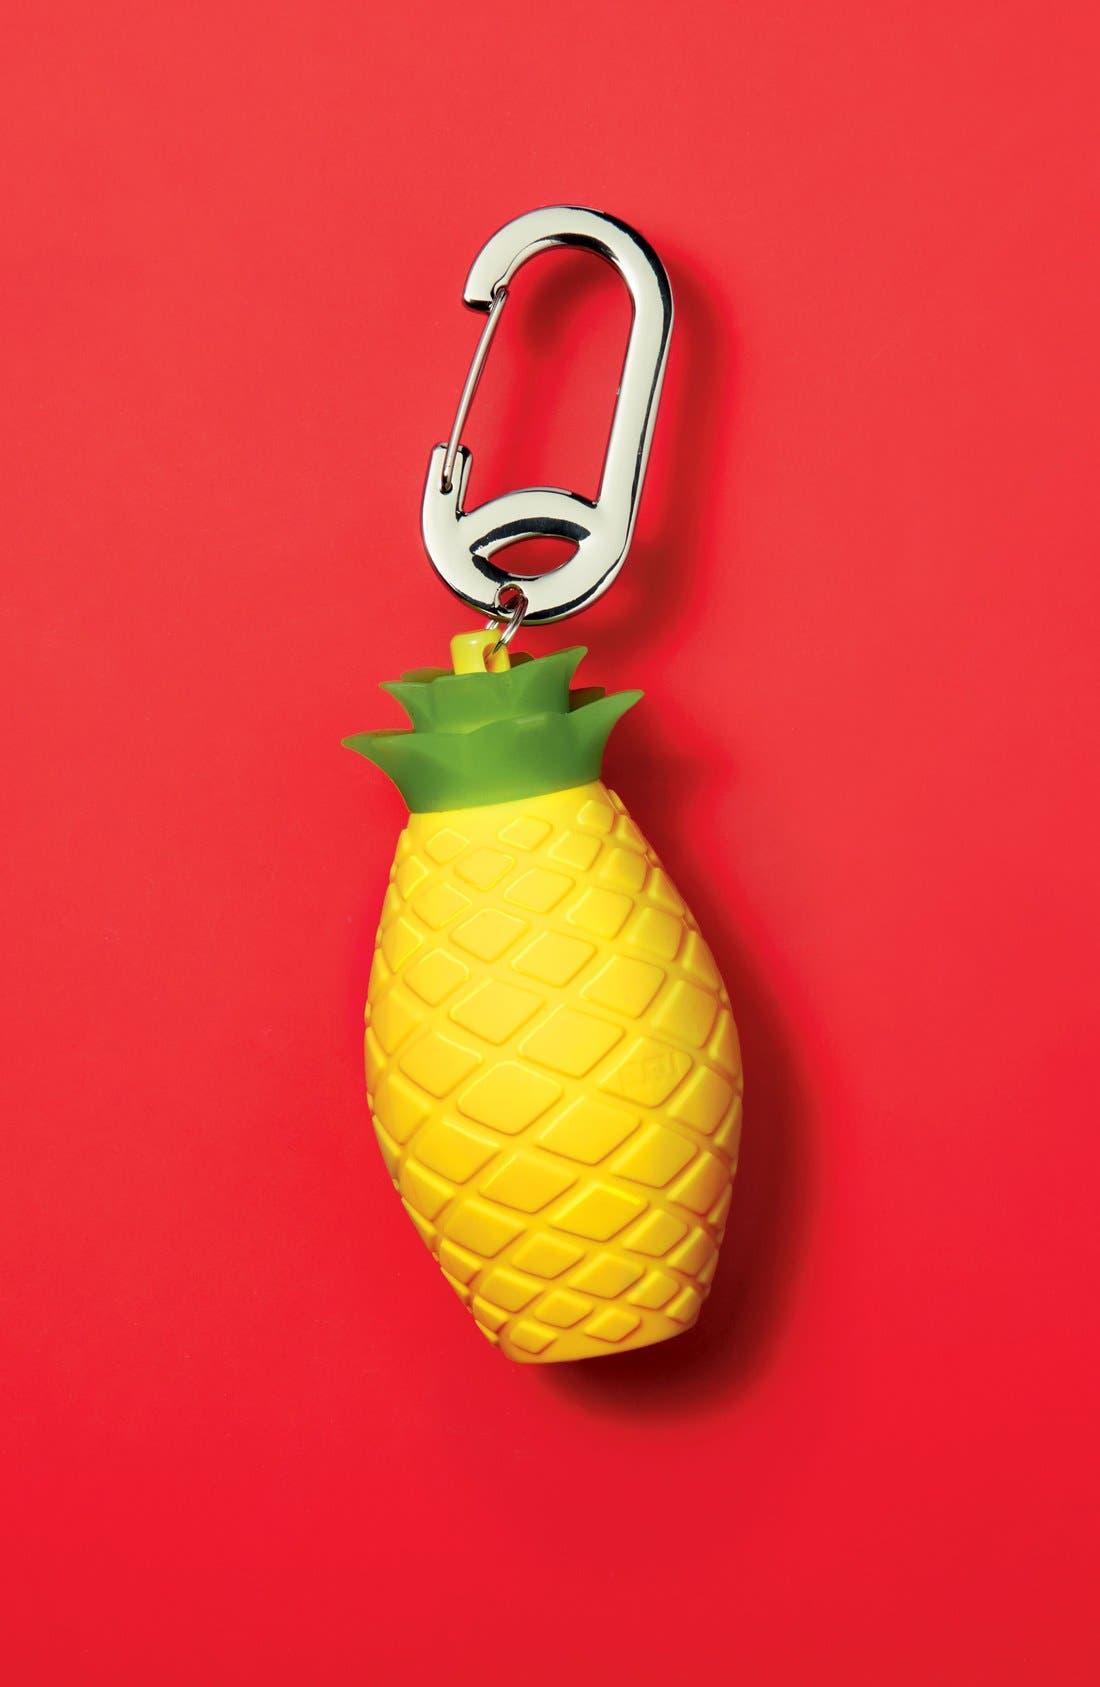 Alternate Image 2  - Buqu Tech 'Pina' Pineapple Shaped USB Power Bank